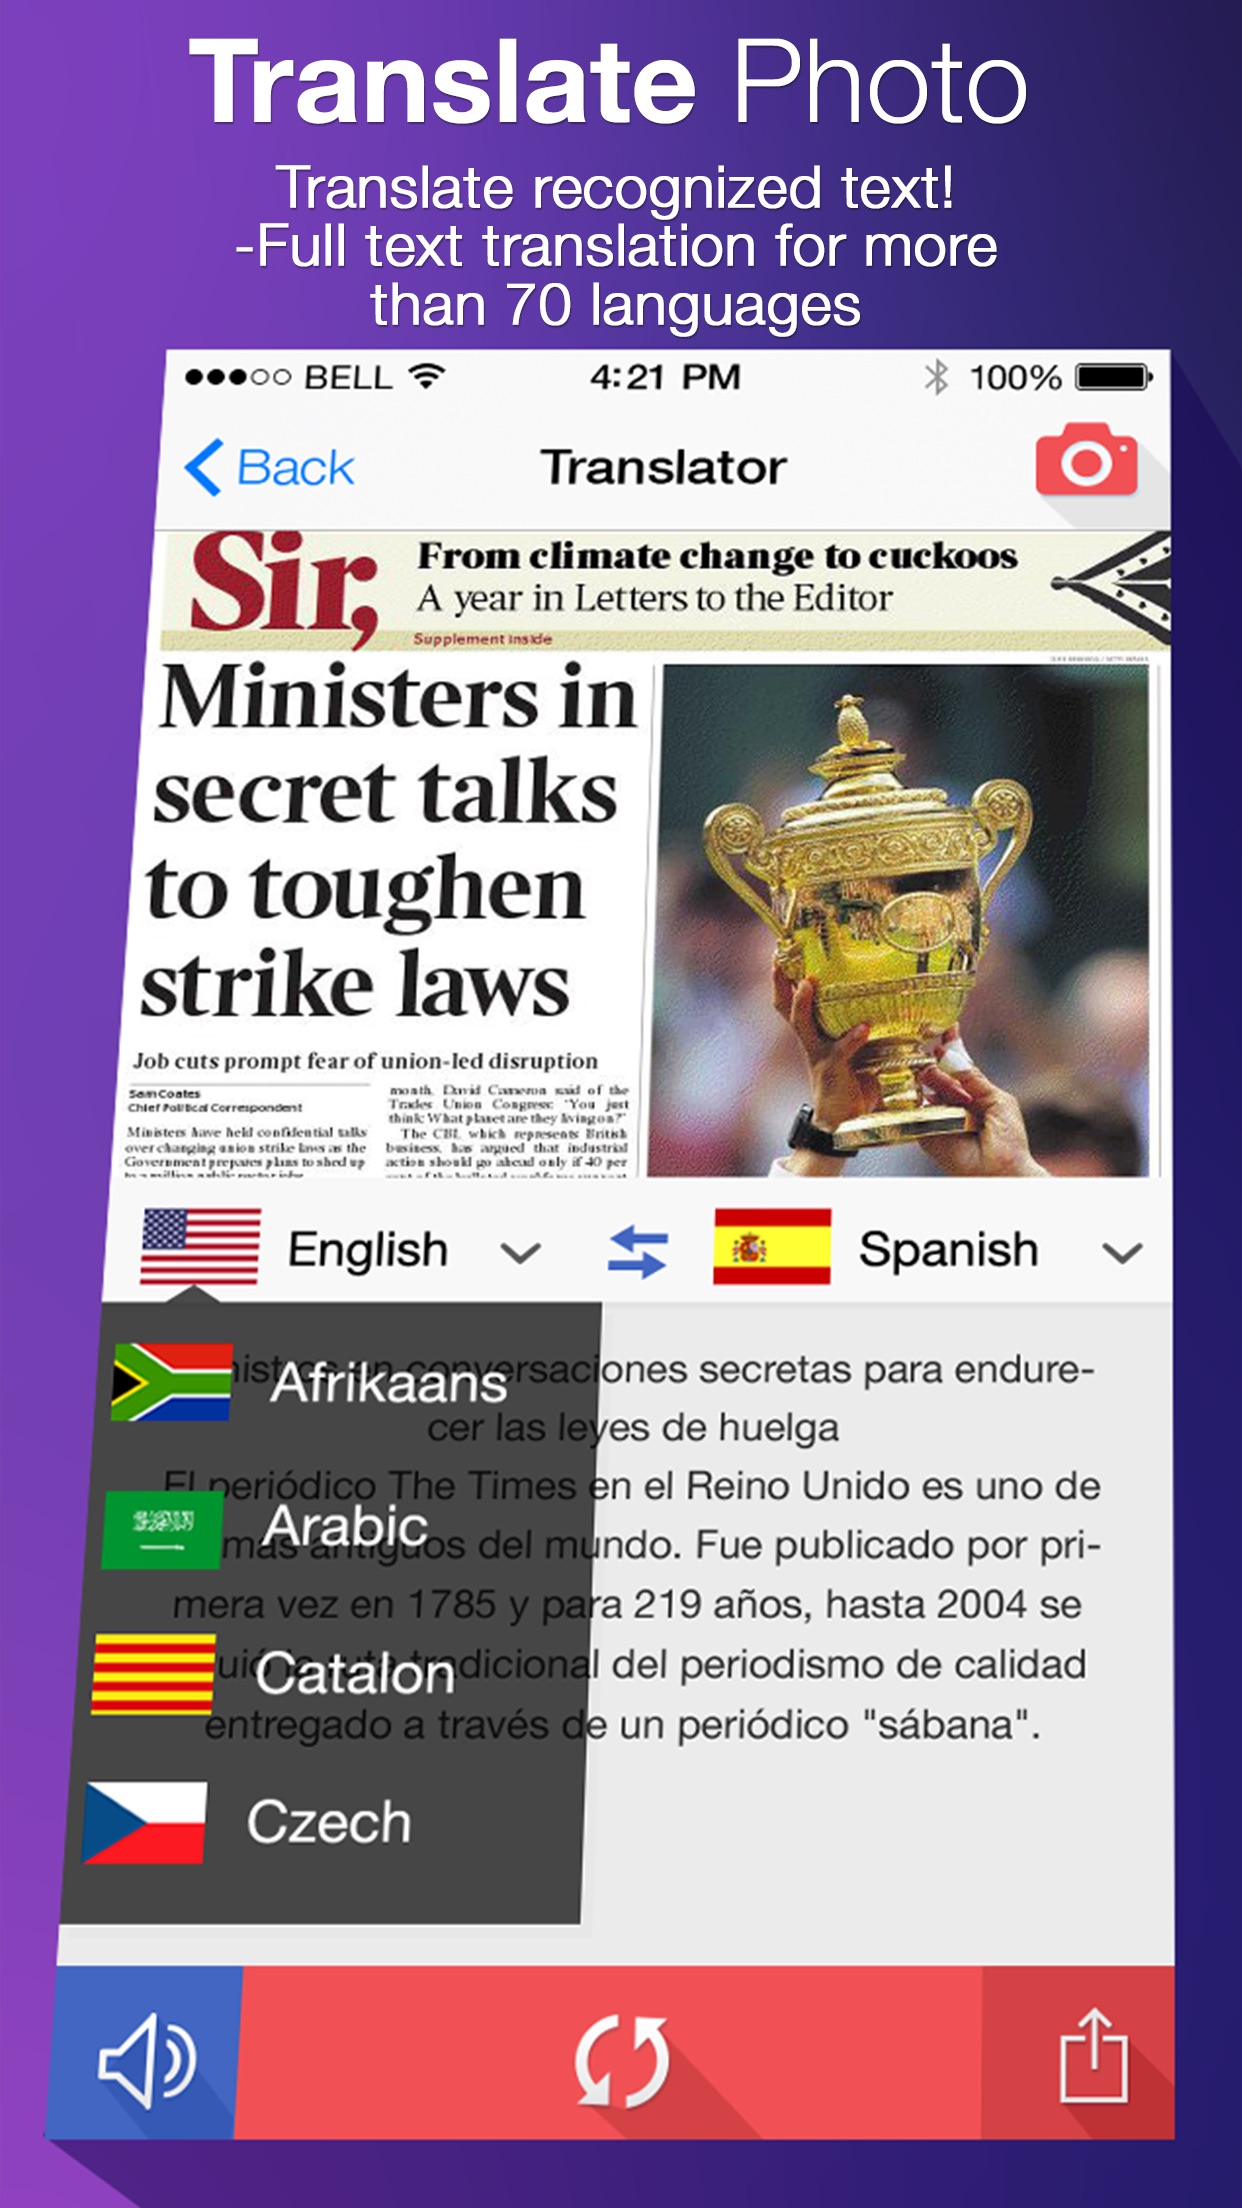 Translate Photo - Camera Scanner OCR & Translator Screenshot